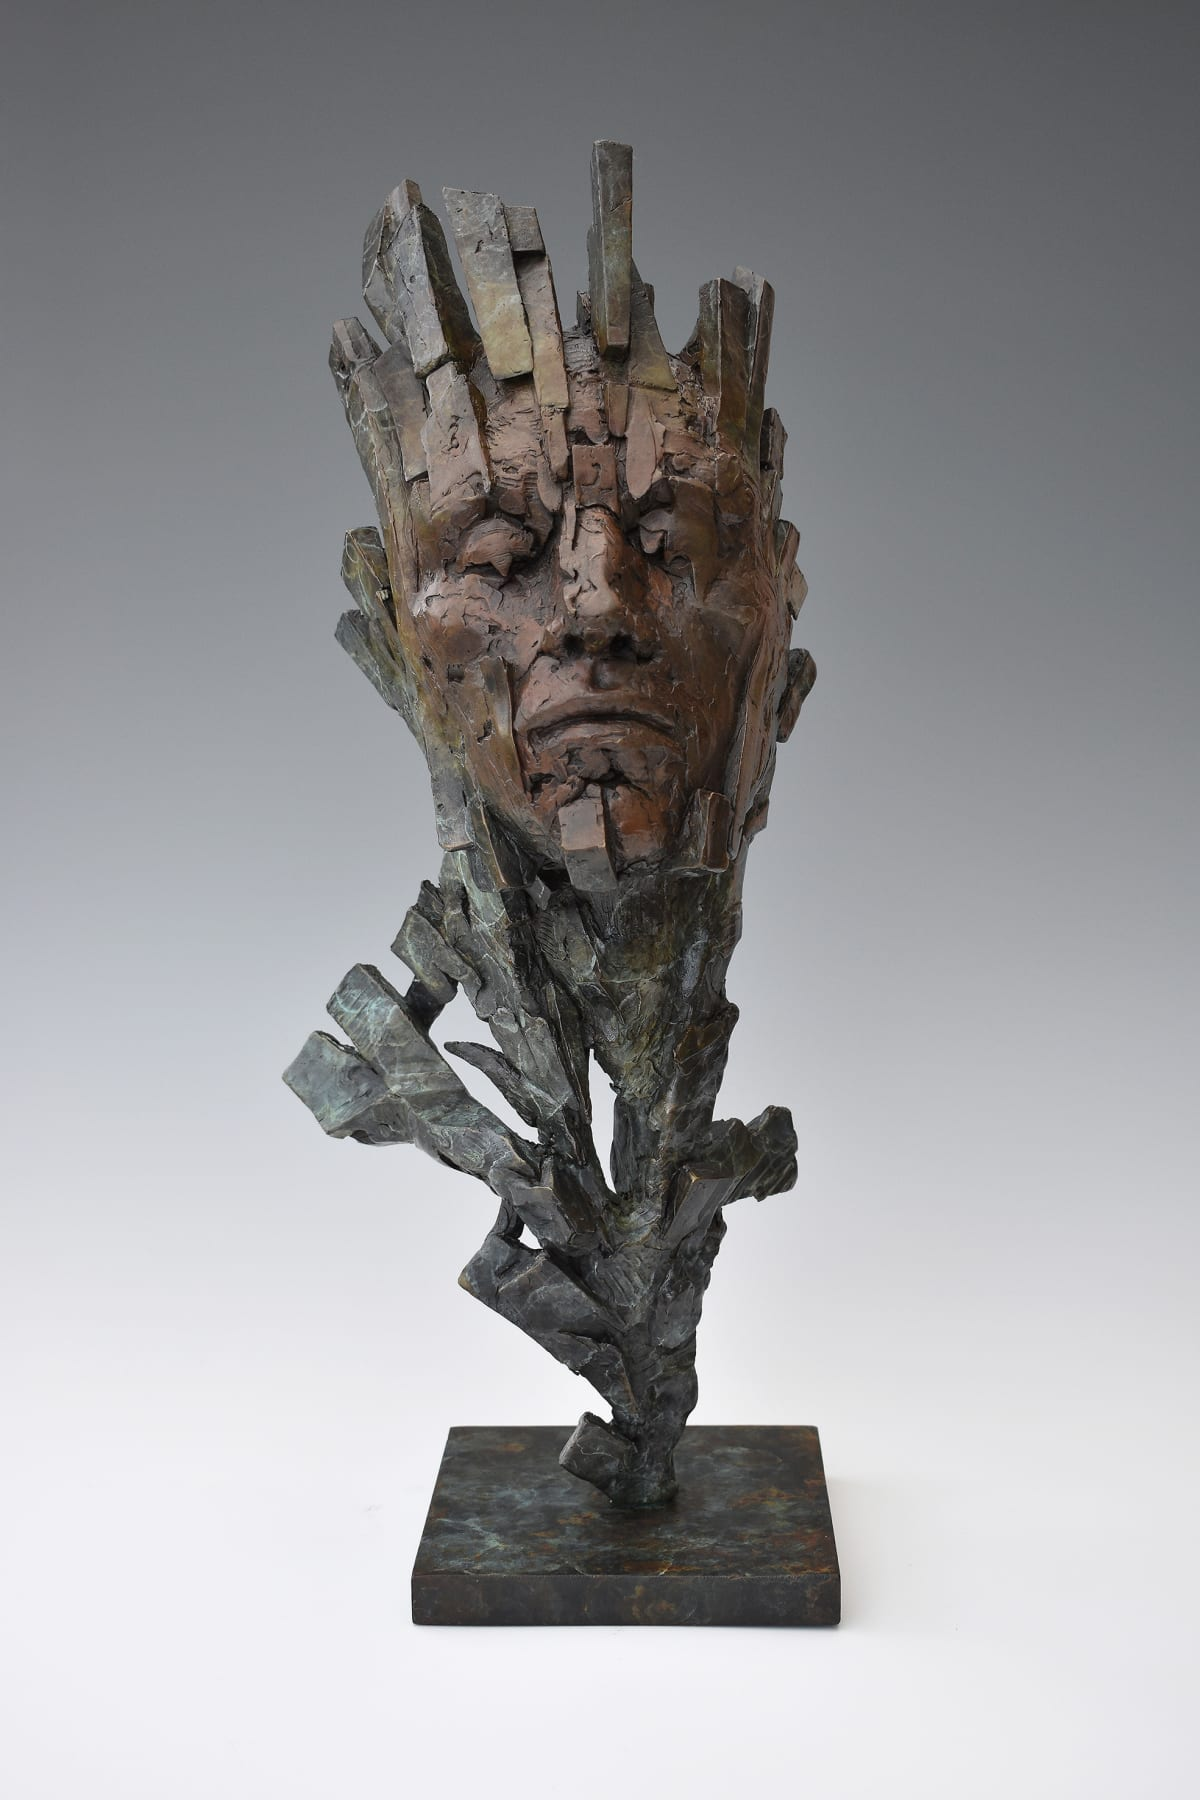 Damon Price Fractured, 2019 Bronze Sculpture 63 x 16 x 18 cm 24 3/4 x 6 1/4 x 7 1/8 in Edition 1 of 1